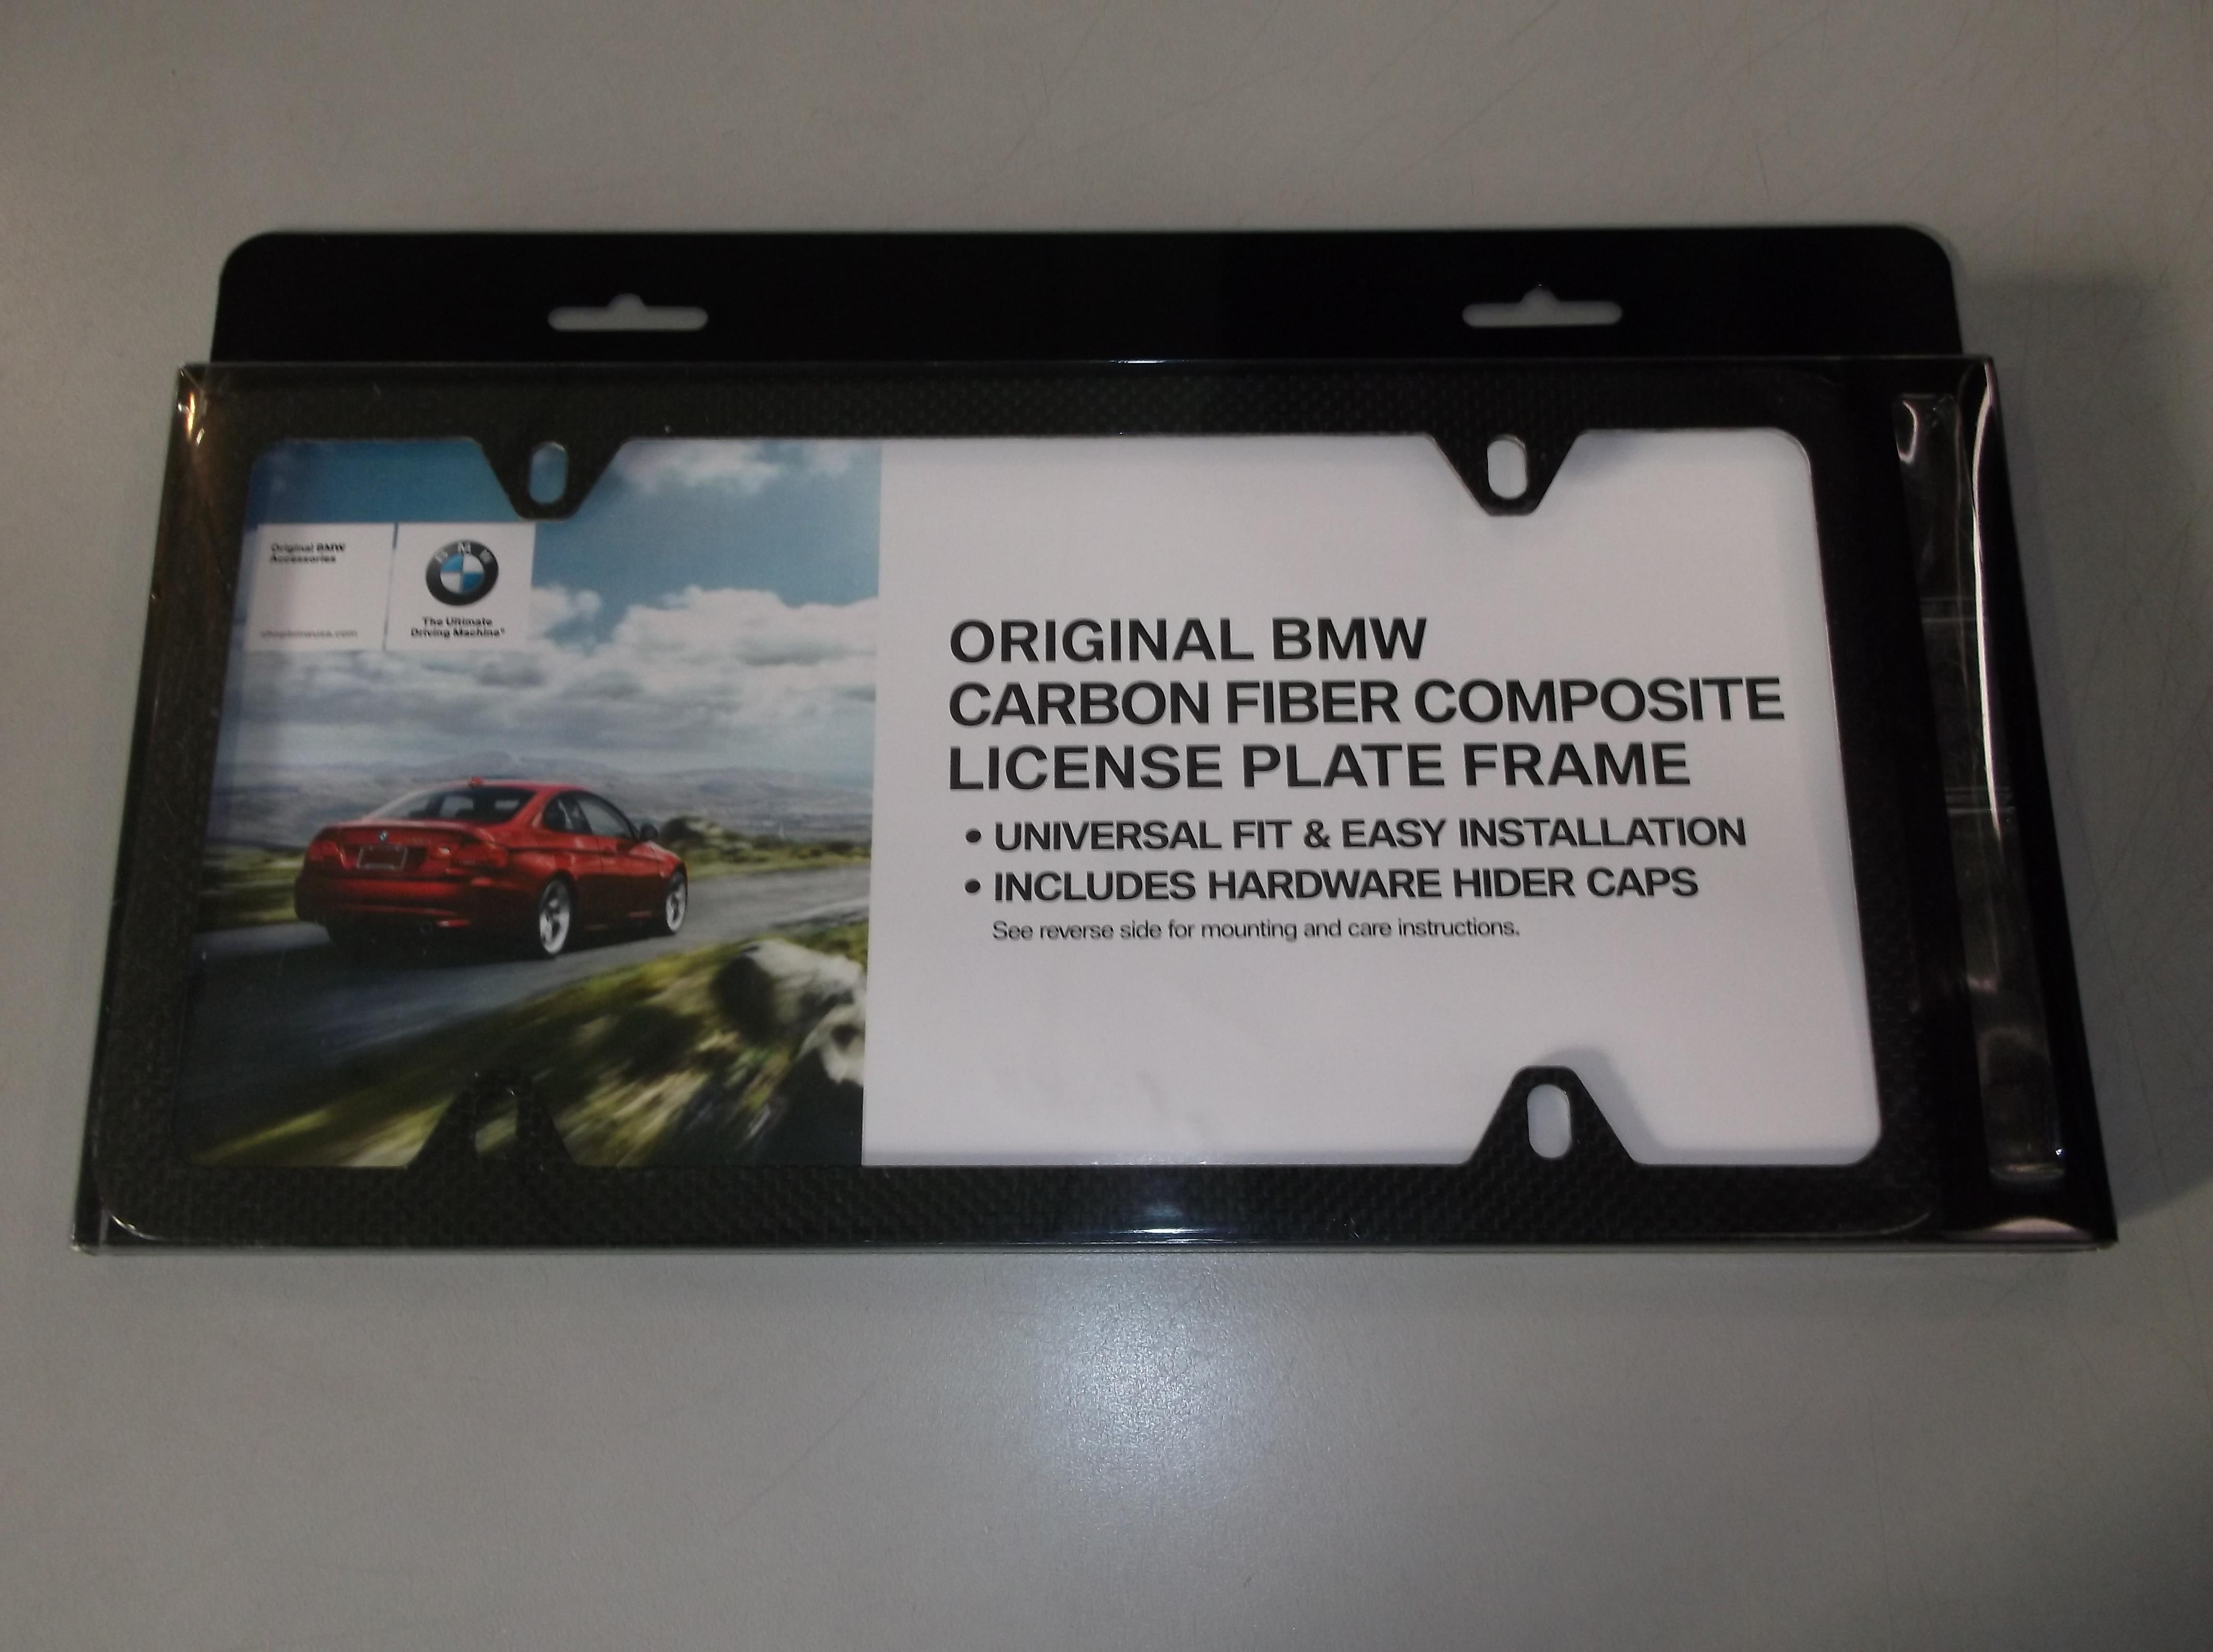 Bmw marco de matrícula-Fibra De Carbono - 82112210415 | eBay